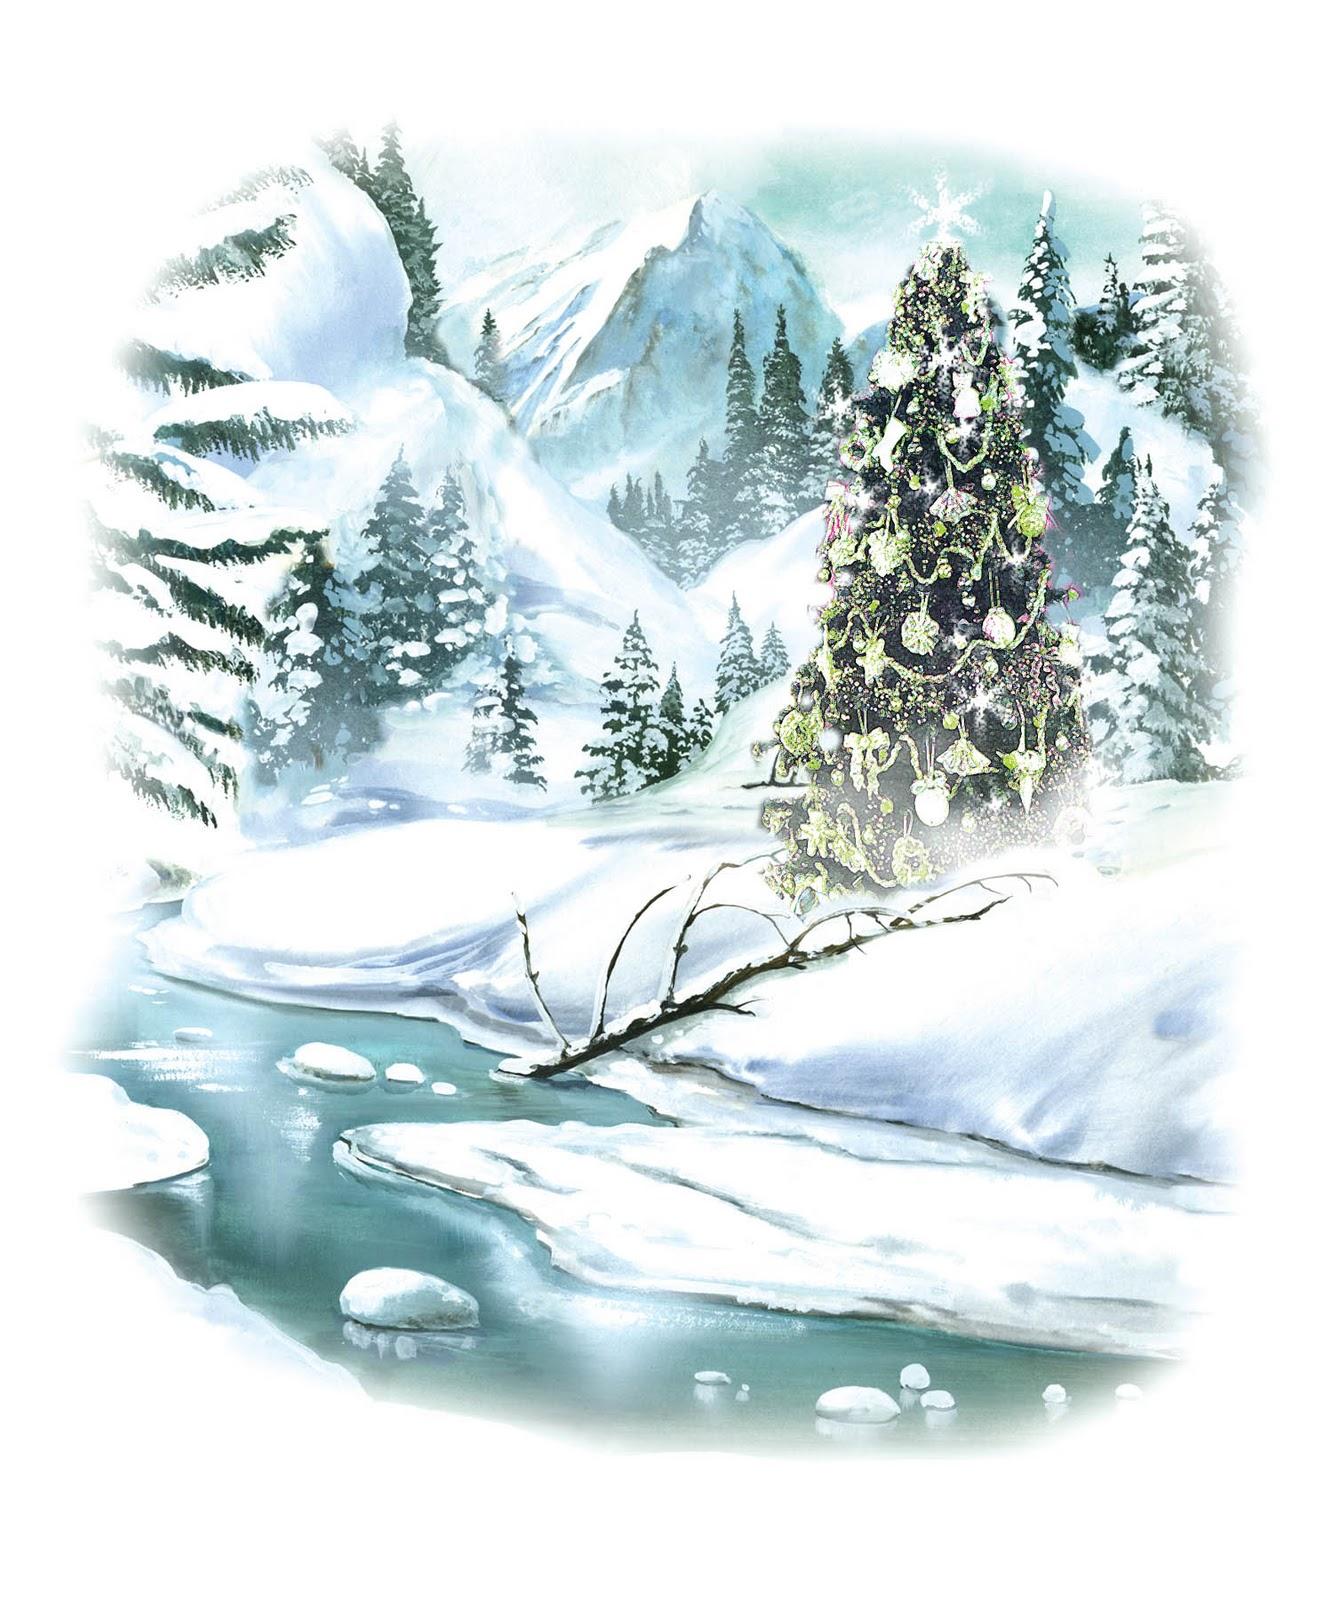 clipart snow scene - photo #18